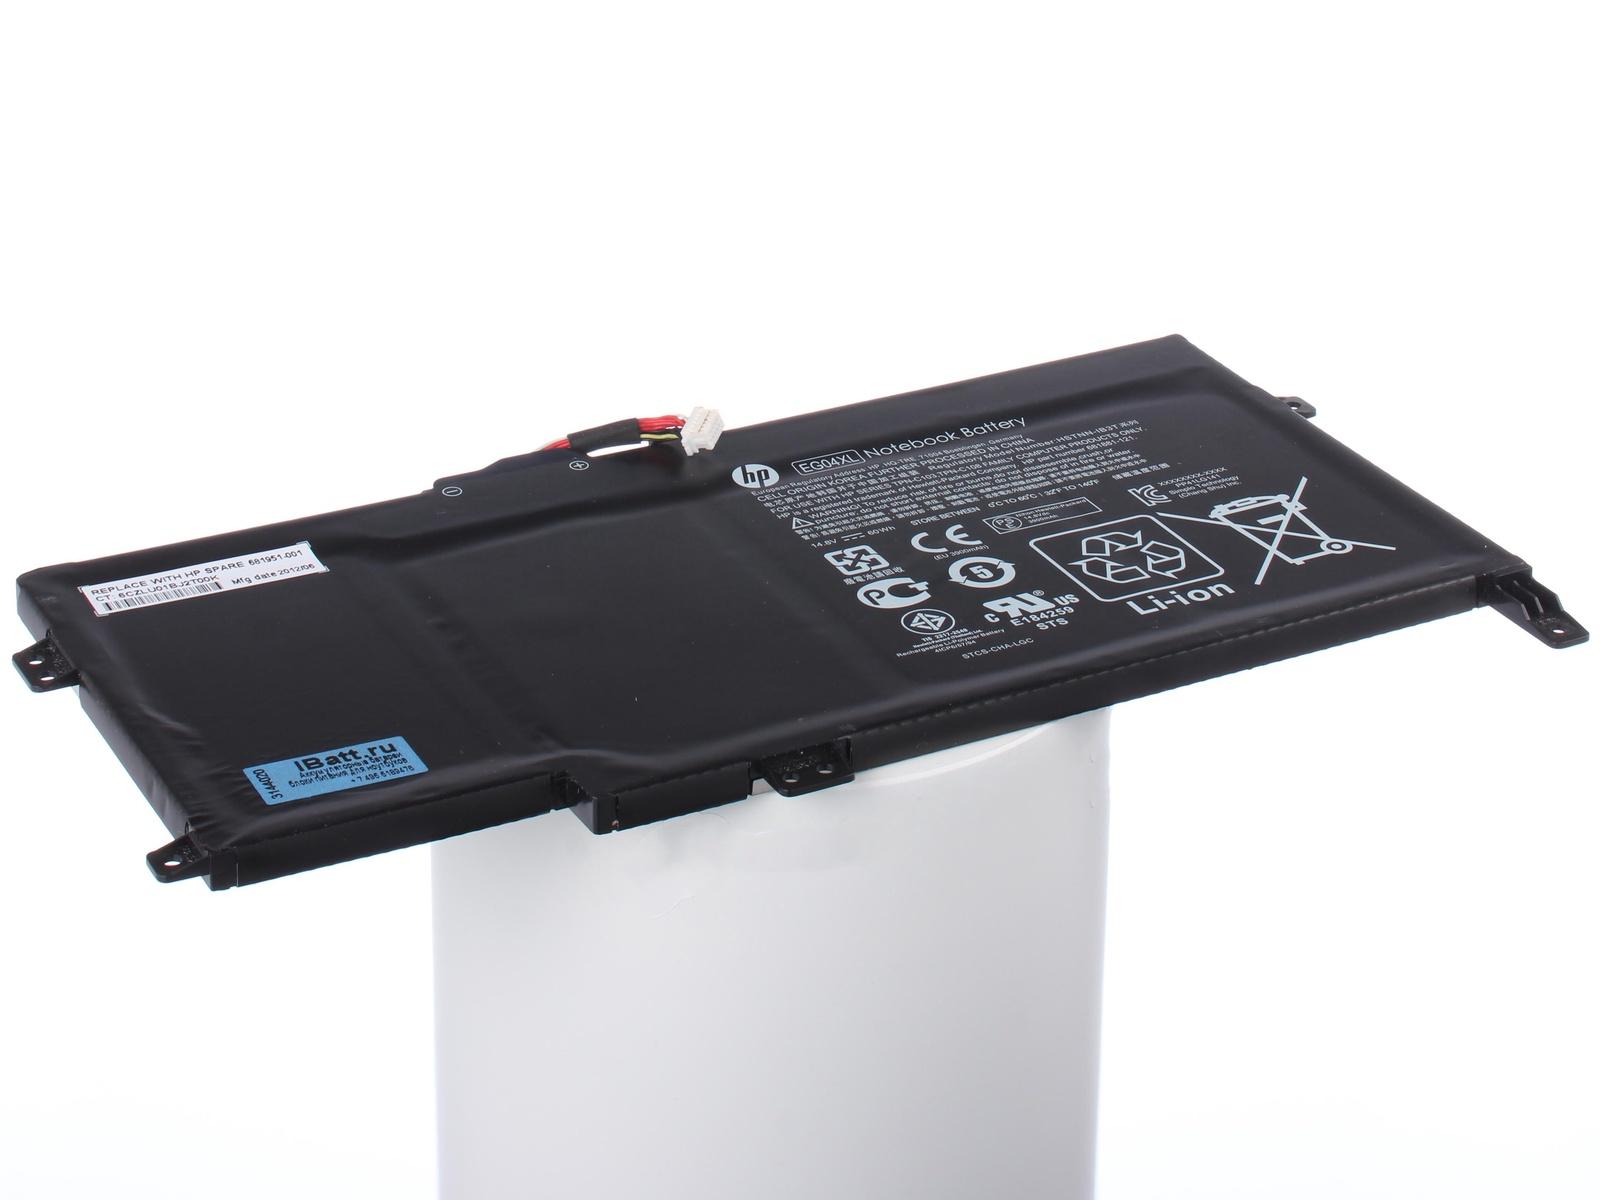 Аккумулятор для ноутбука iBatt для HP-Compaq Envy 6-1151er, ENVY Sleekbook 6-1252er, Envy 6-1155er, Envy 6-1054er, ENVY Ultrabook 6-1254er, Envy 6-1152er, Envy 6-1055er, ENVY Sleekbook 6-1151er, ENVY Sleekbook 6-1101er цена